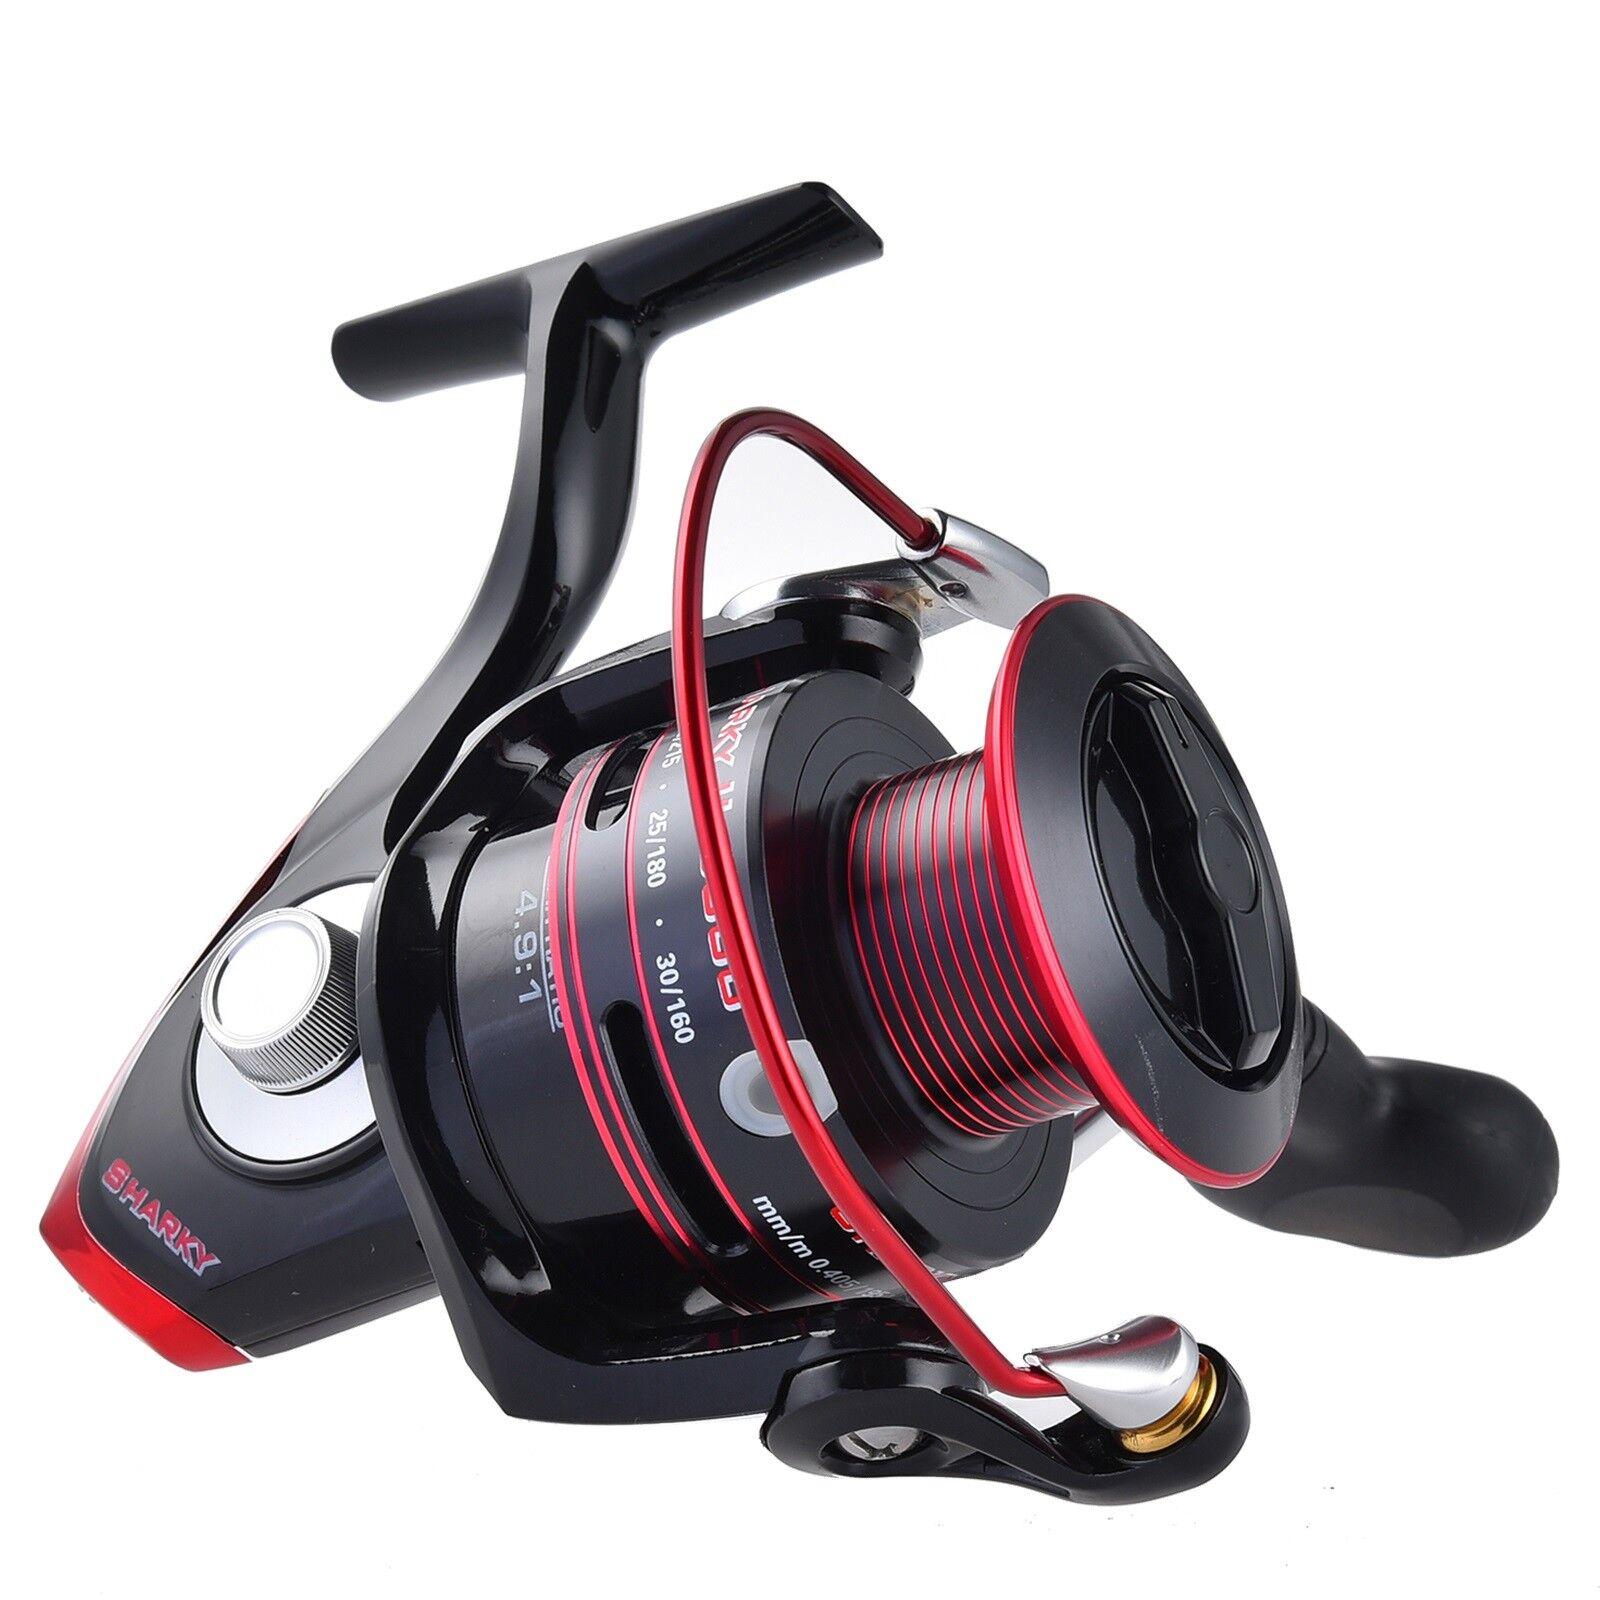 KastKing Sharky II Spinning Fishing Reels Size 1500 to 8000 48.5 LB Max Drag